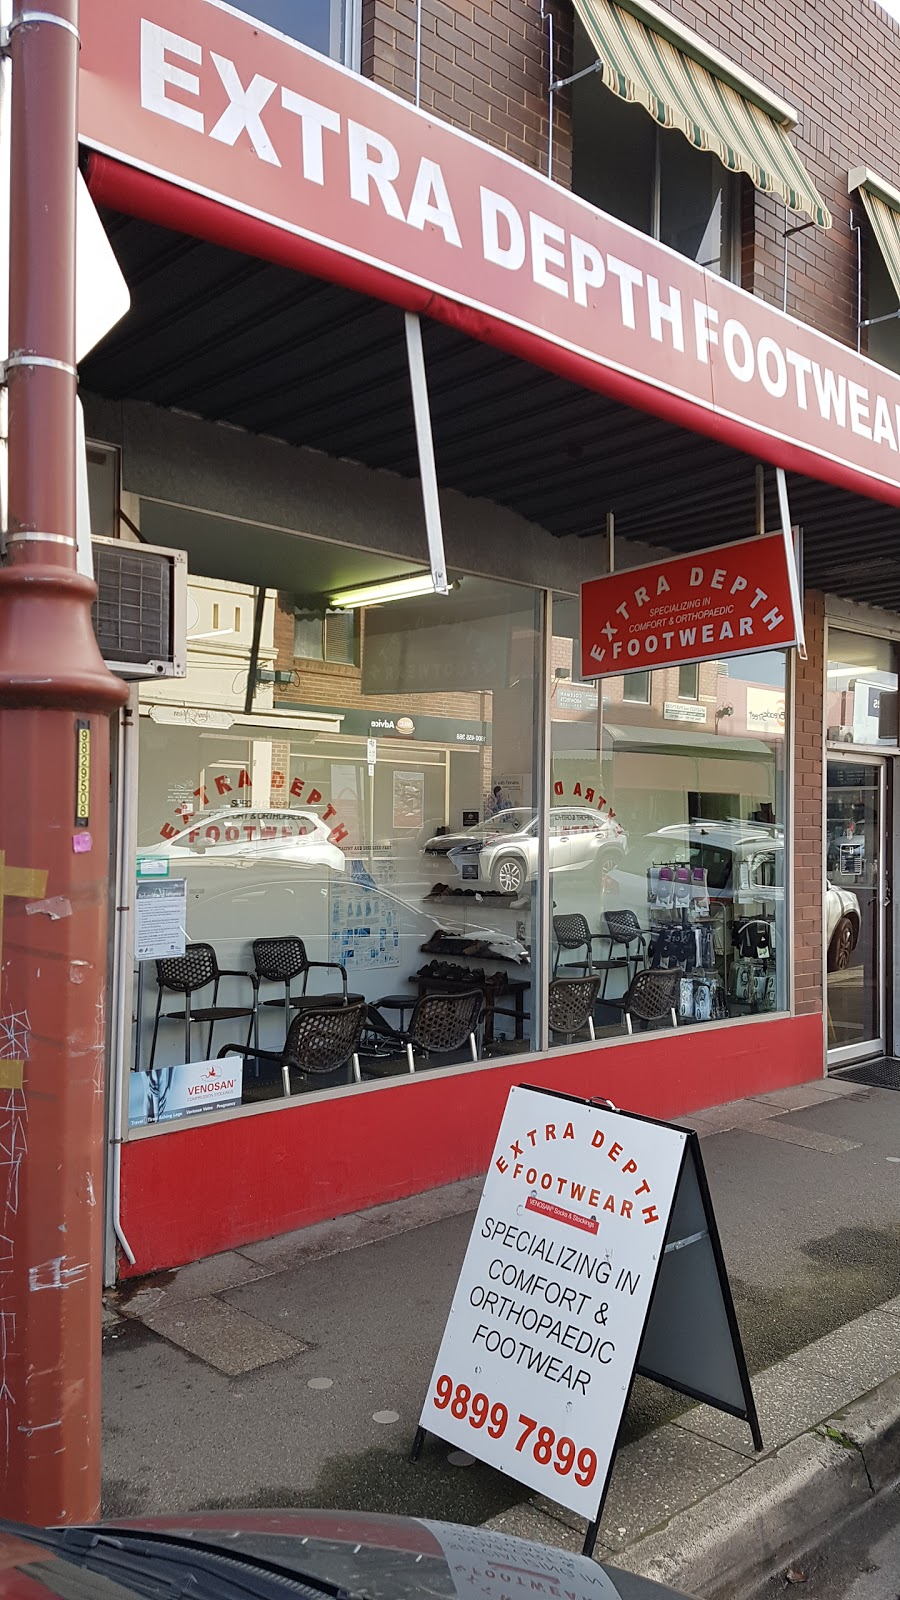 Extra Depth Footwear Mont Albert Store | shoe store | 1E Hamilton St, Mont Albert VIC 3127, Australia | 0398997899 OR +61 3 9899 7899